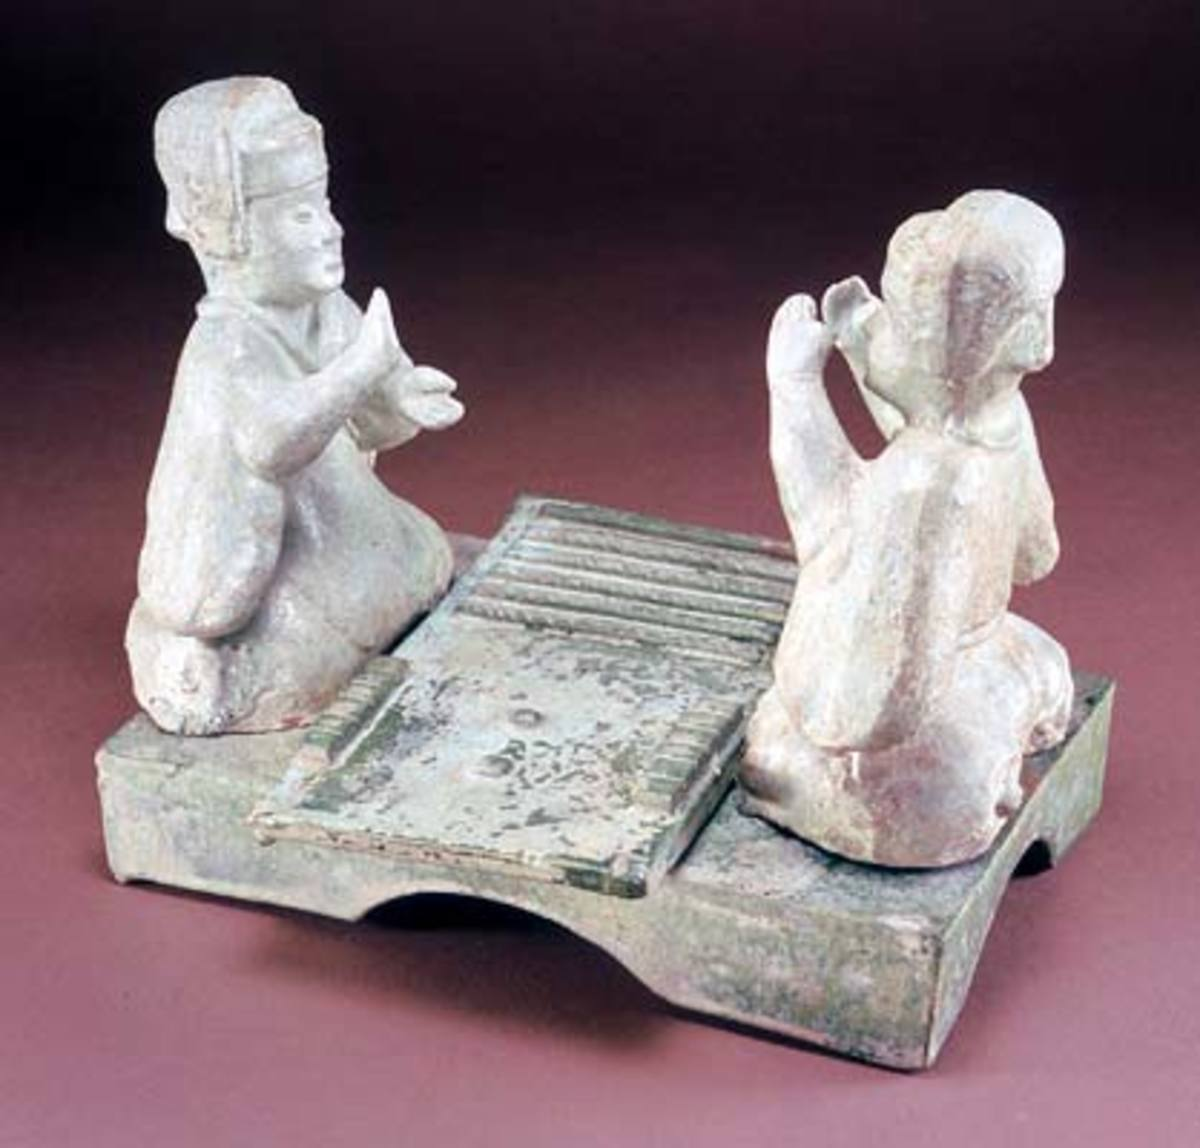 Liubo players, Han dynasty (206 BCE - 220 CE), China.